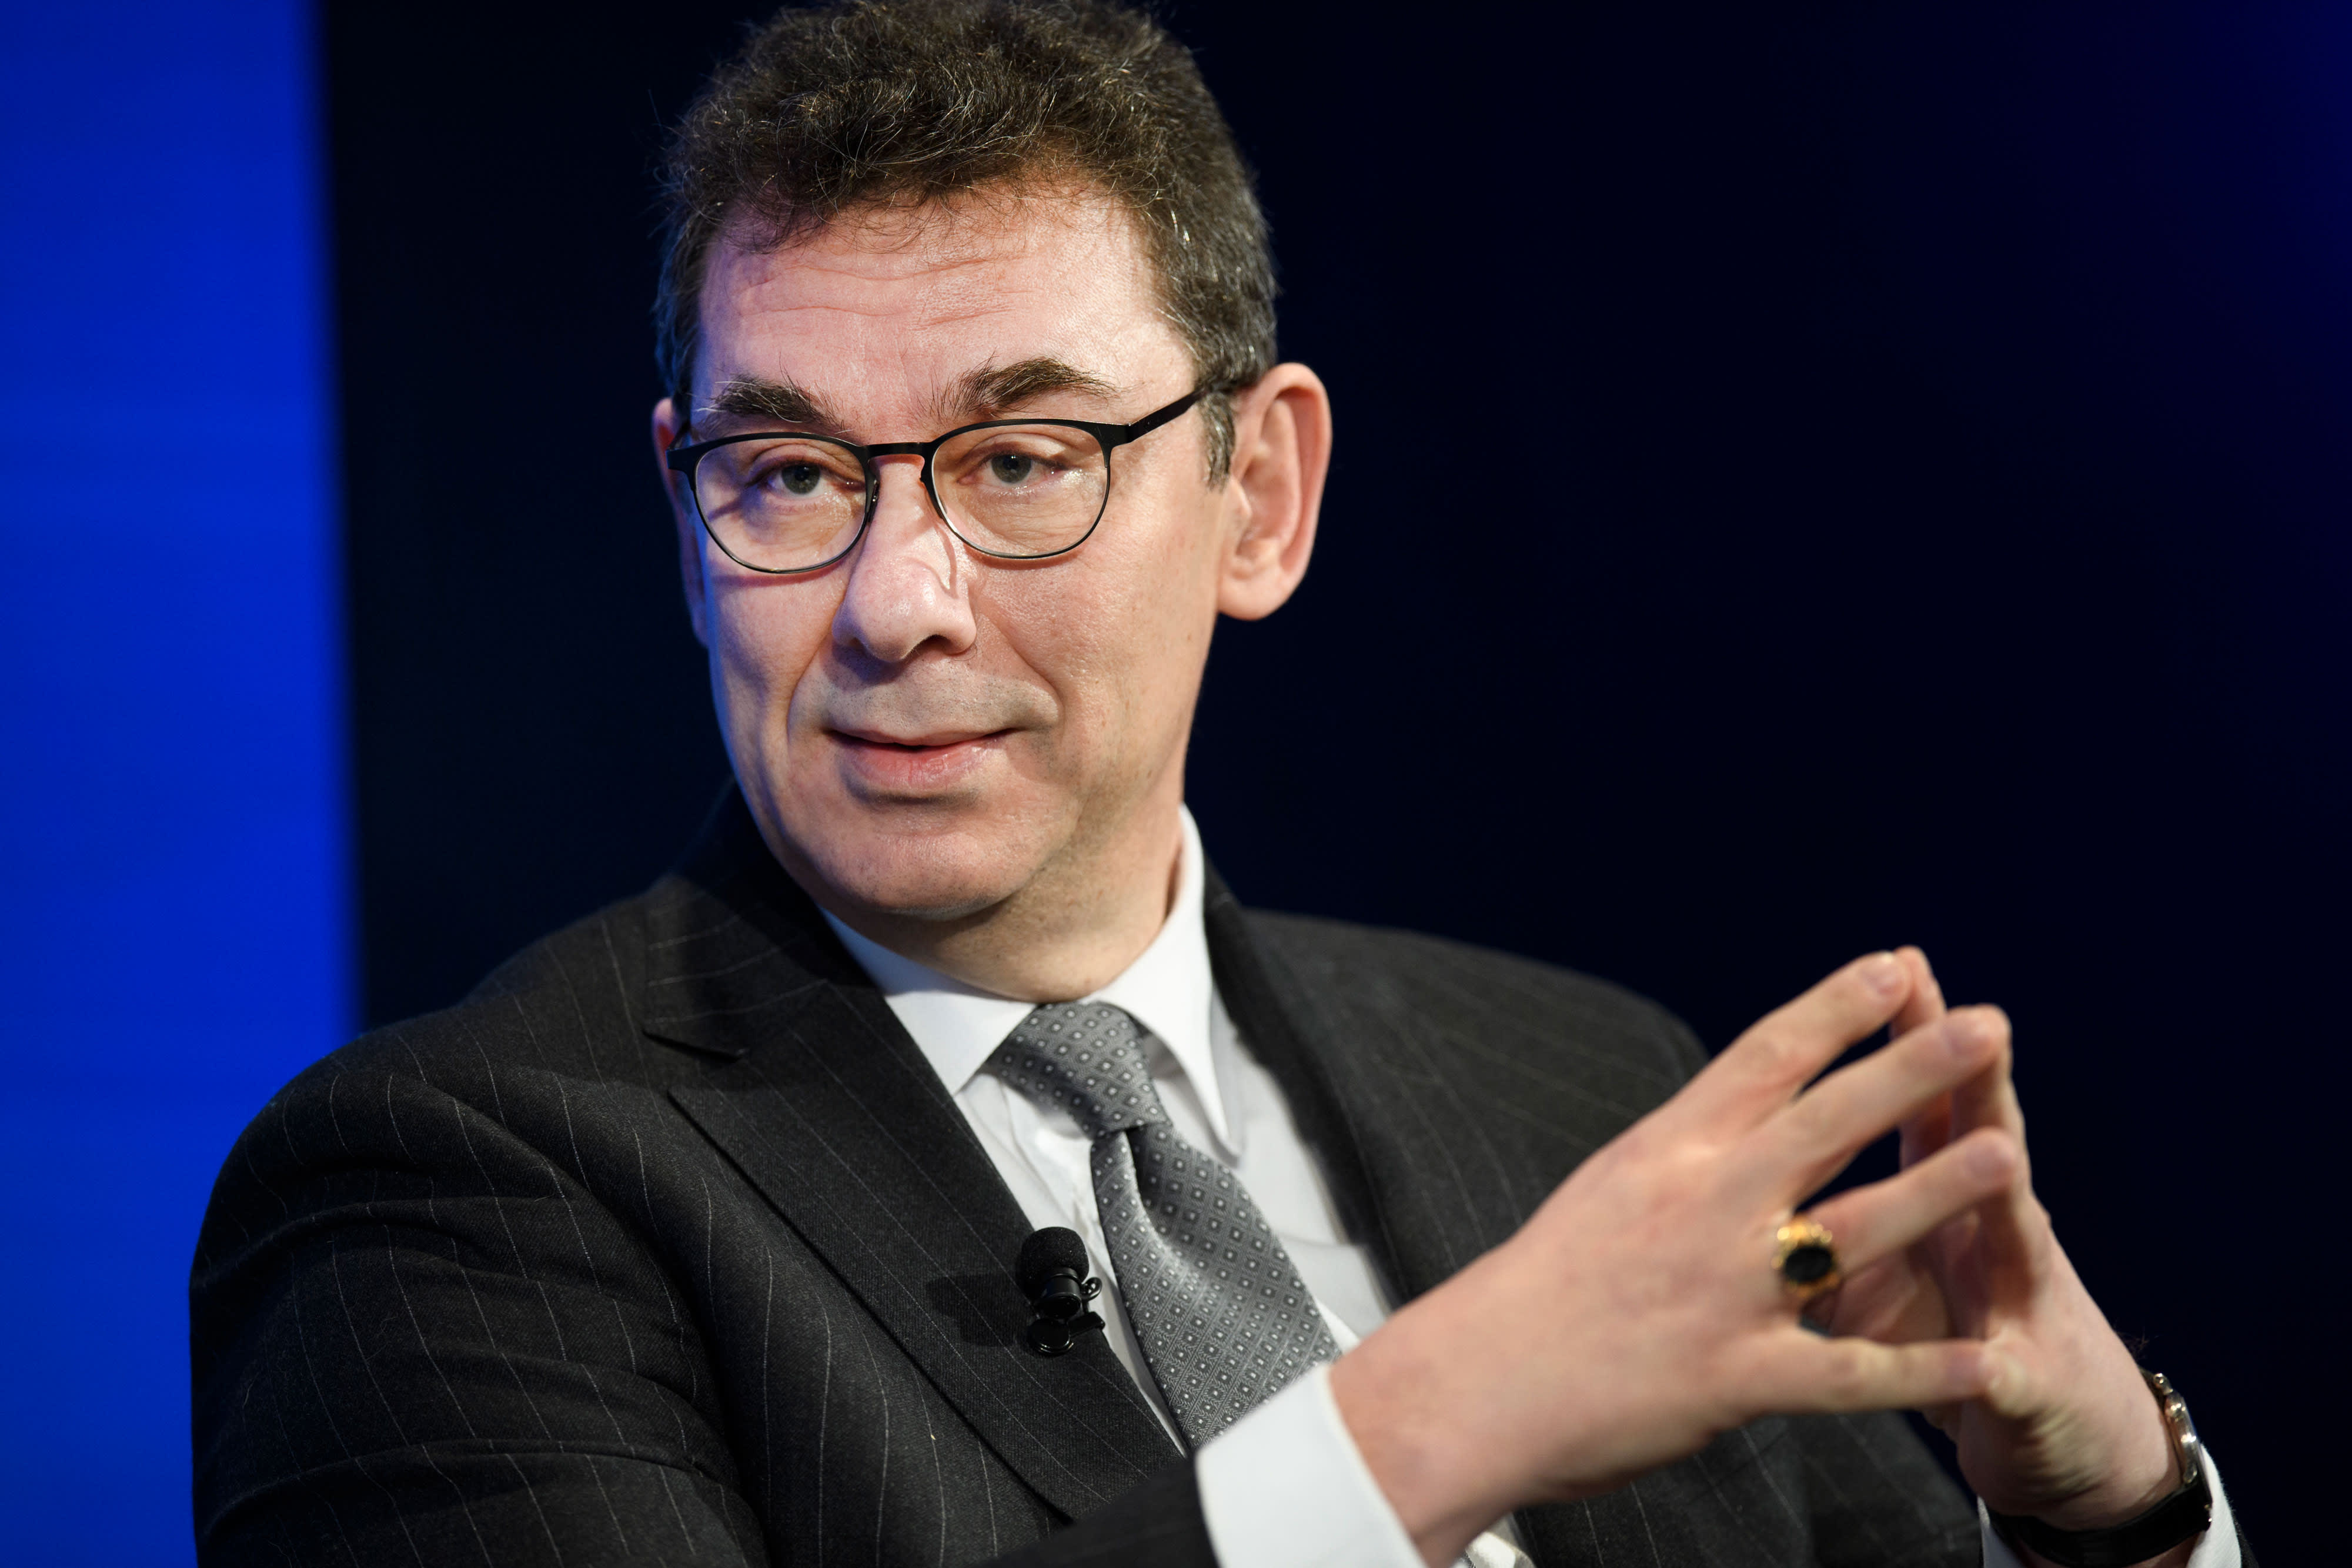 Pfizer announces Dr. Albert Bourla will succeed CEO Ian Read effective  January 1